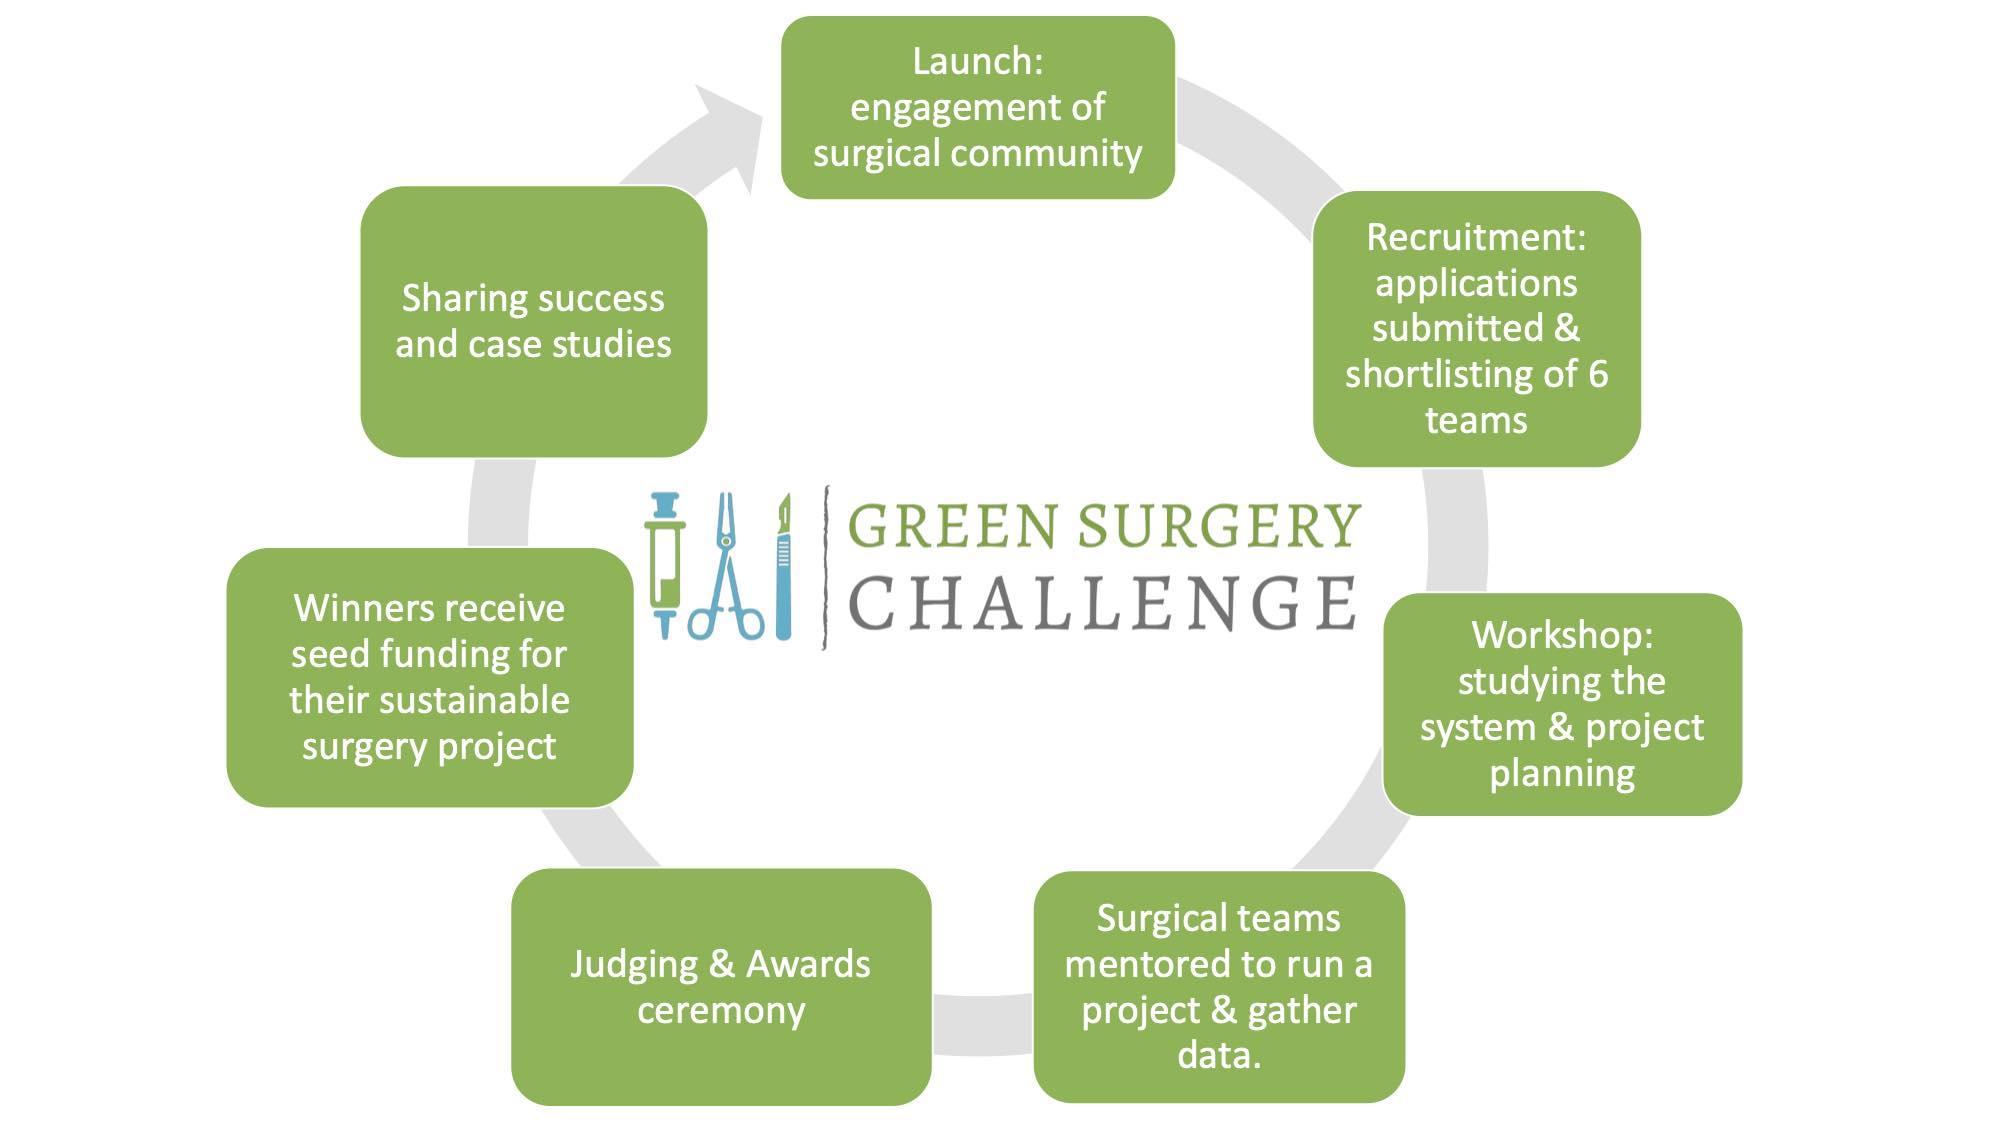 Green surgery challenge process